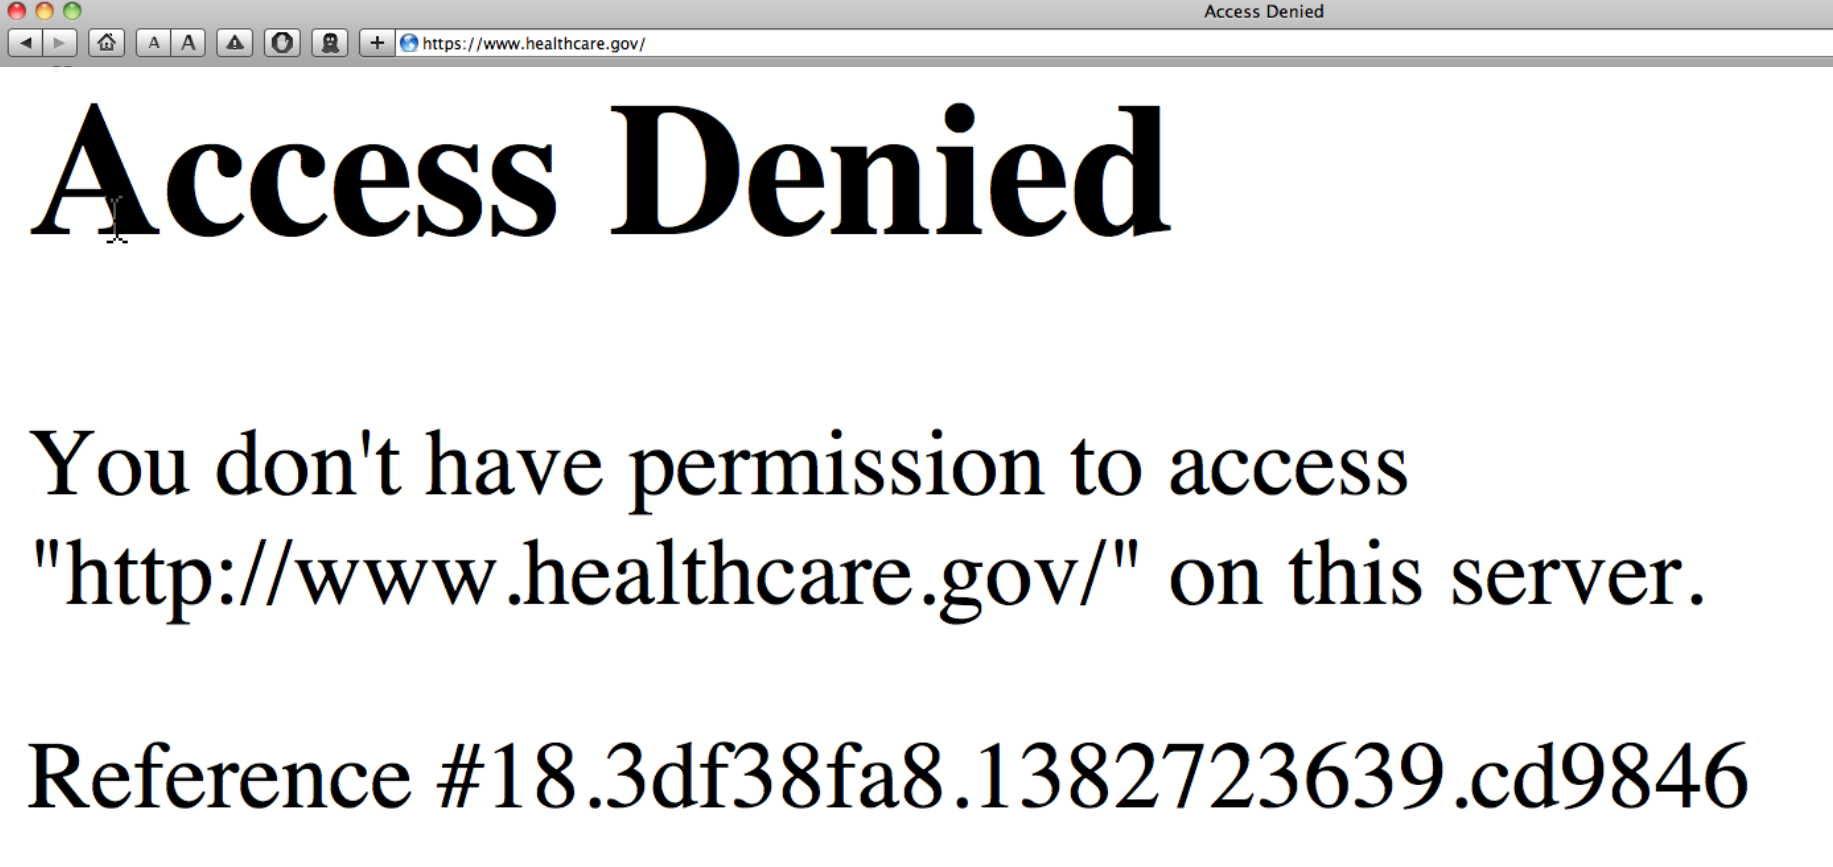 Obamacare website 'access denied' Oct. 25, 2013